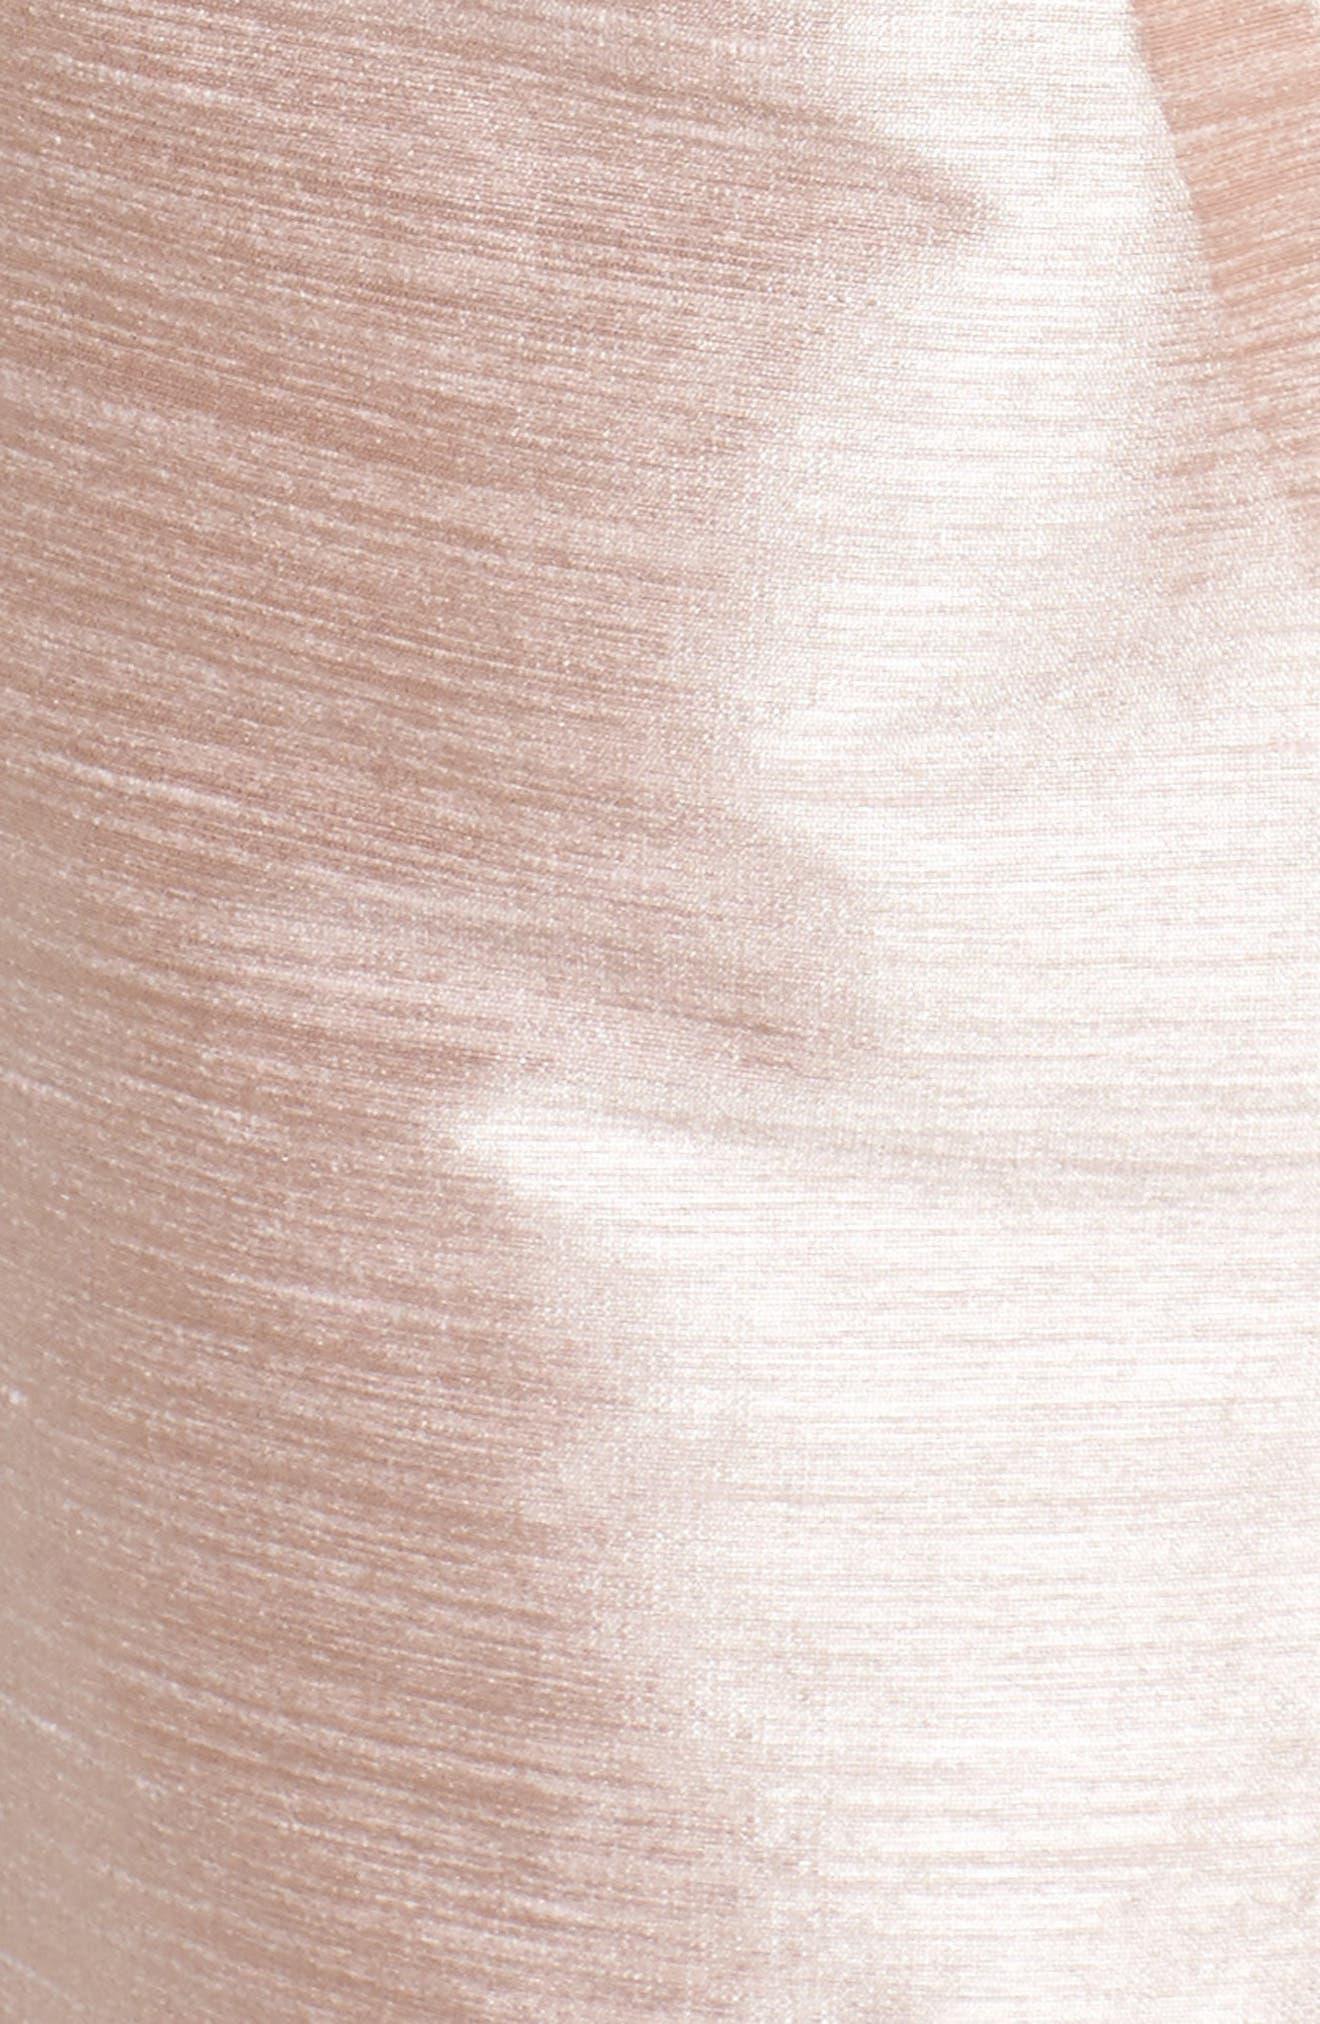 Boatneck Sheath Dress,                             Alternate thumbnail 7, color,                             PEARL PINK